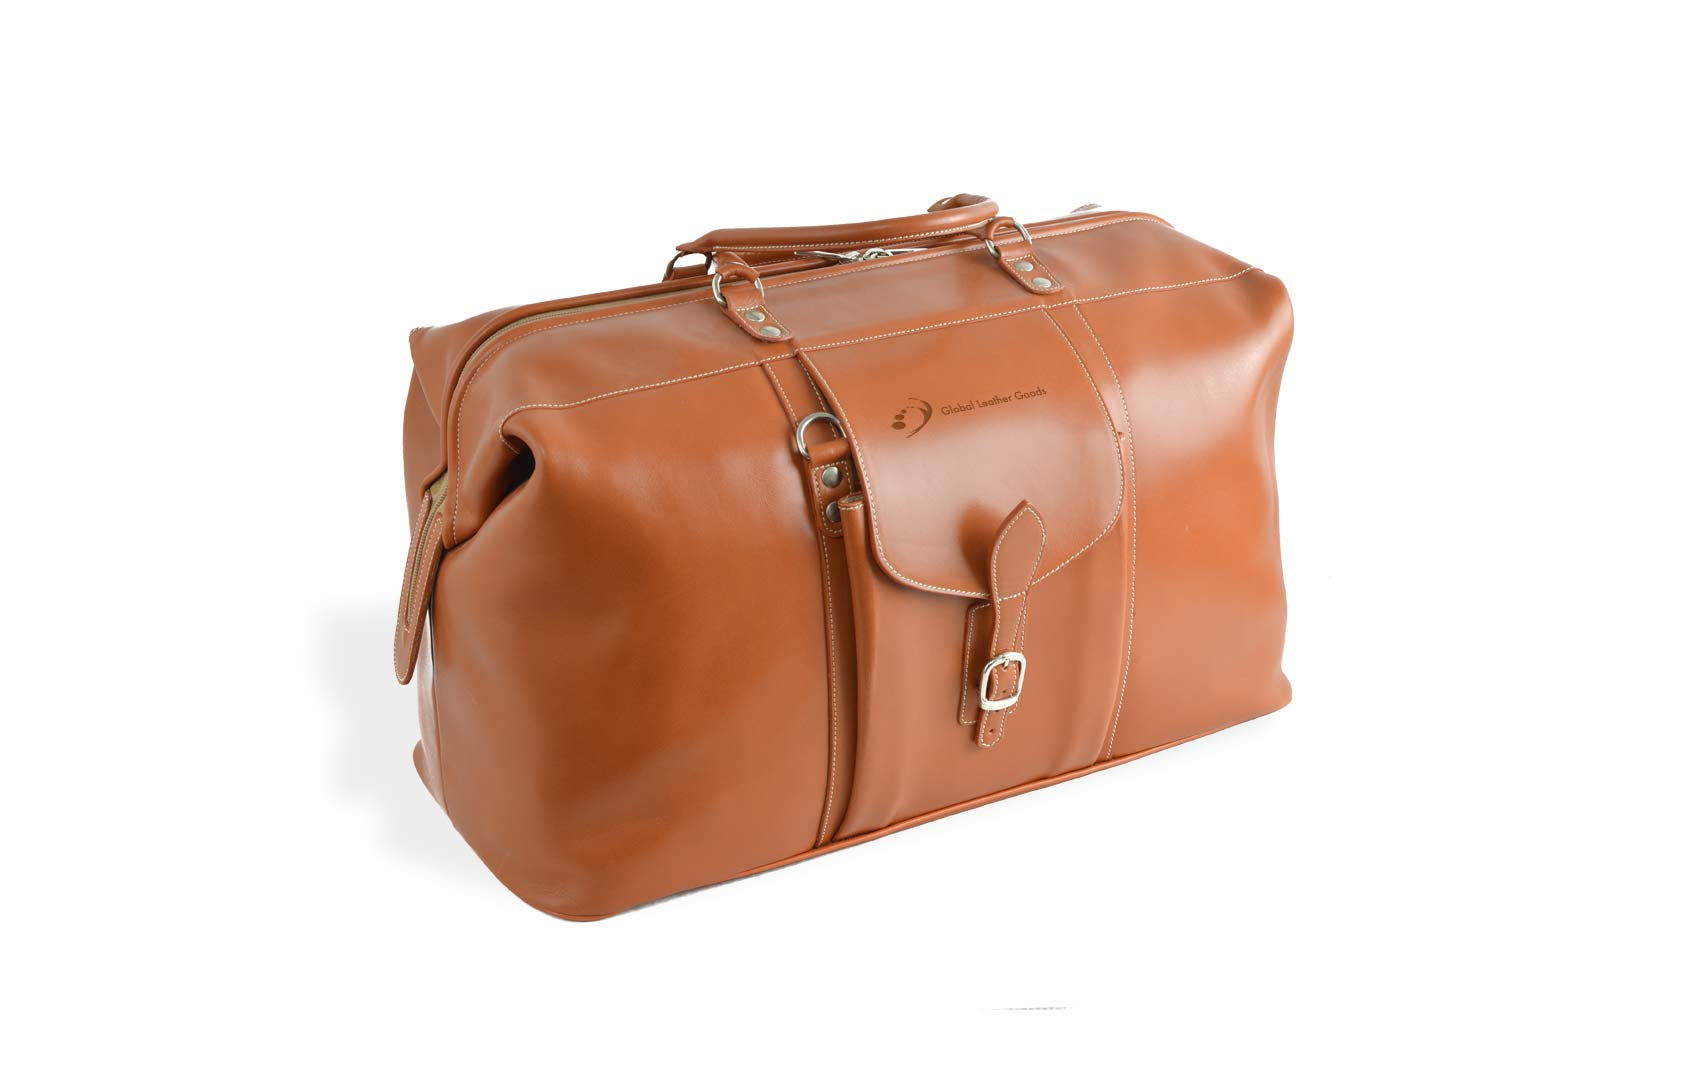 accesorios de viaje bolso travel hand bag